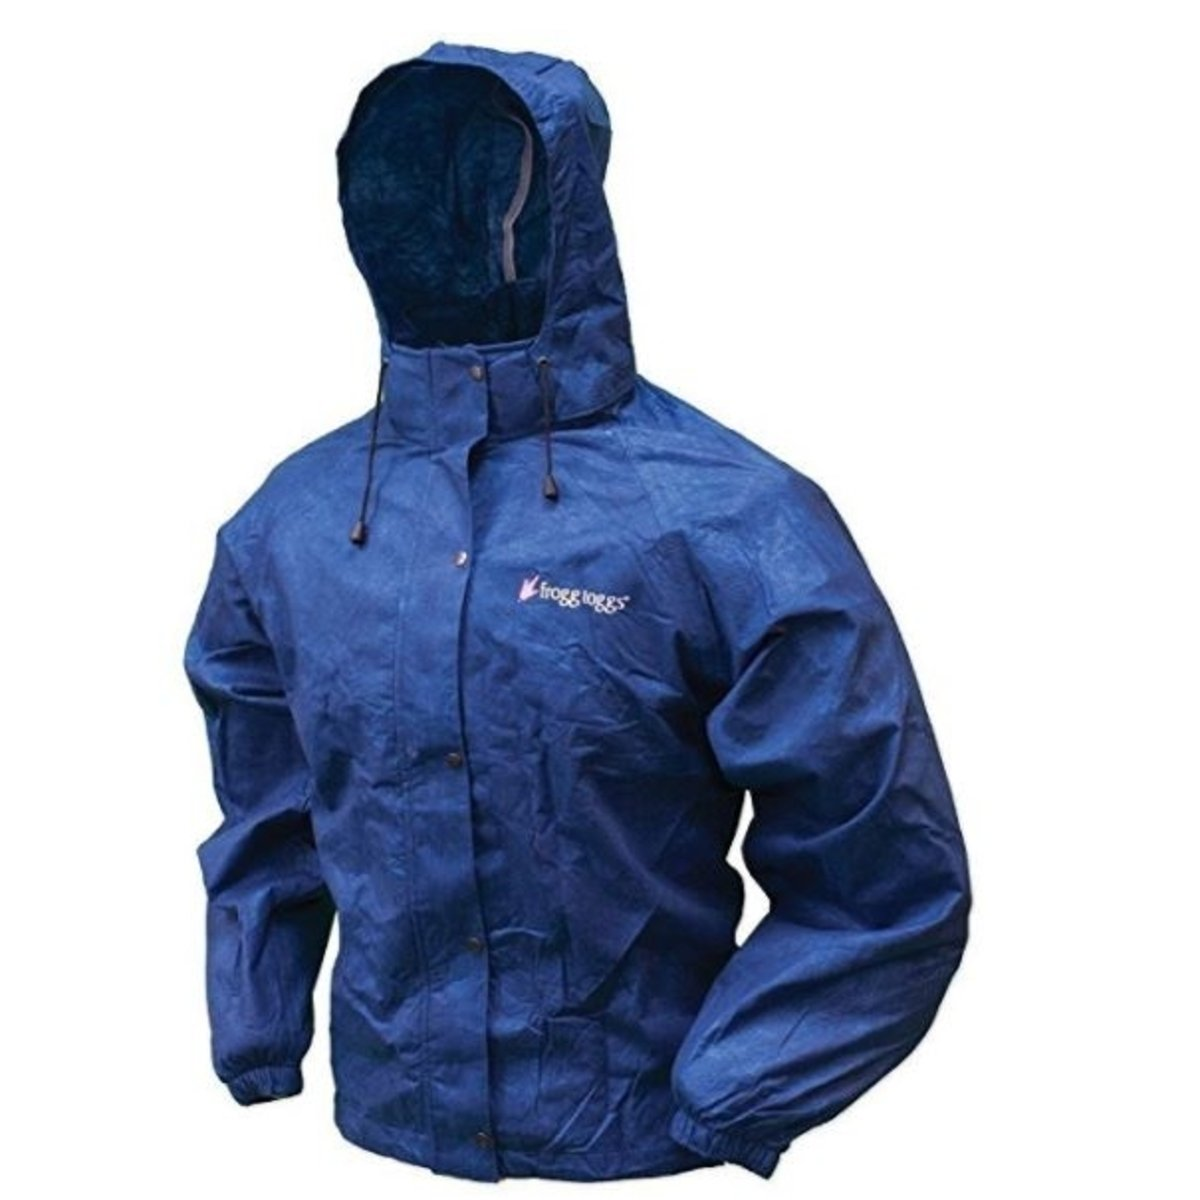 Frogg Toggs Women's All Purpose Rain Jacket, Royal Blue, Large/X-Large